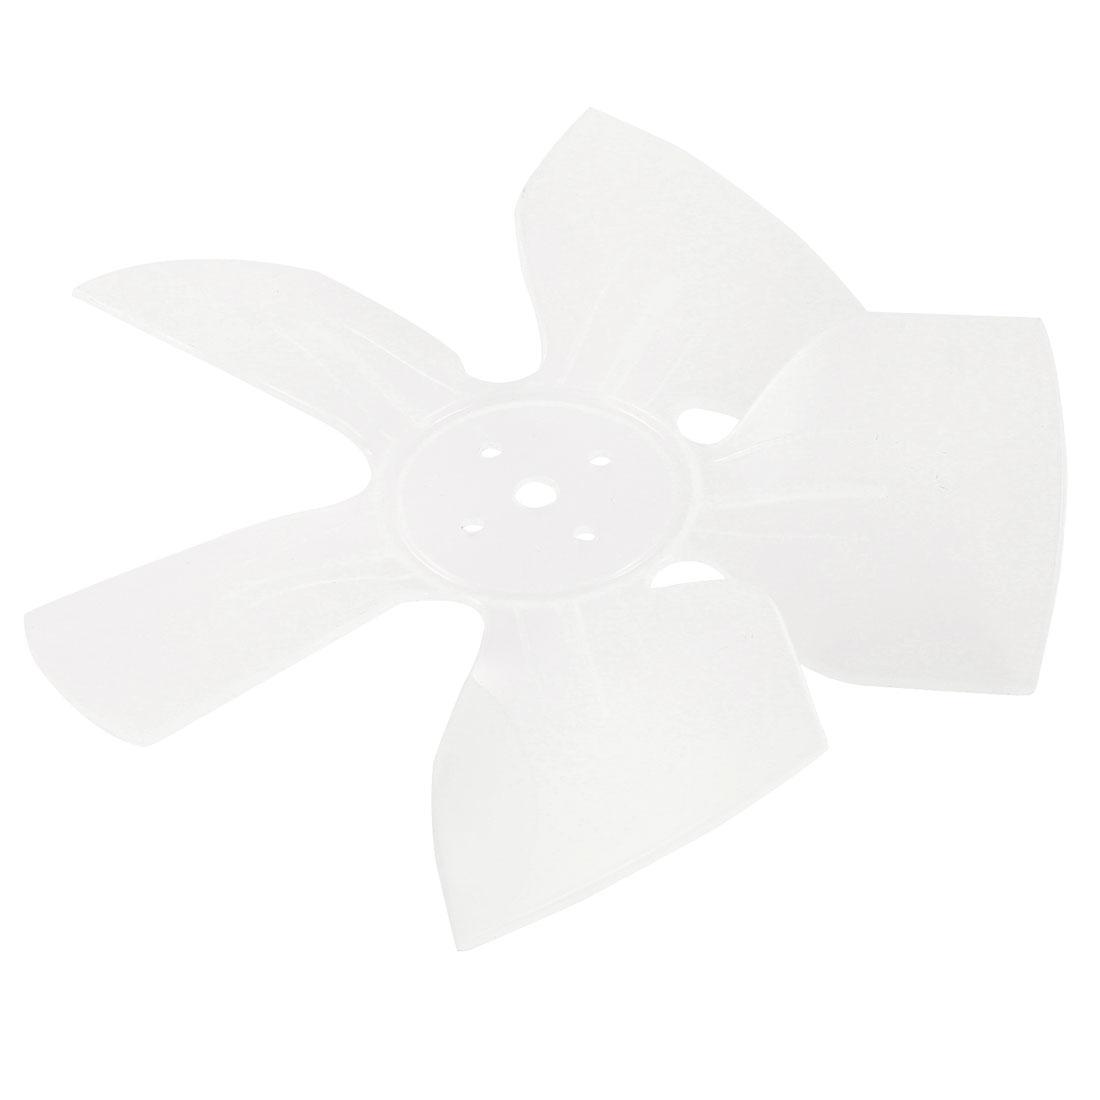 "White Plastic Freezer Refrigertor Exaust Motor Fan Vanes 6.7"" Dia"